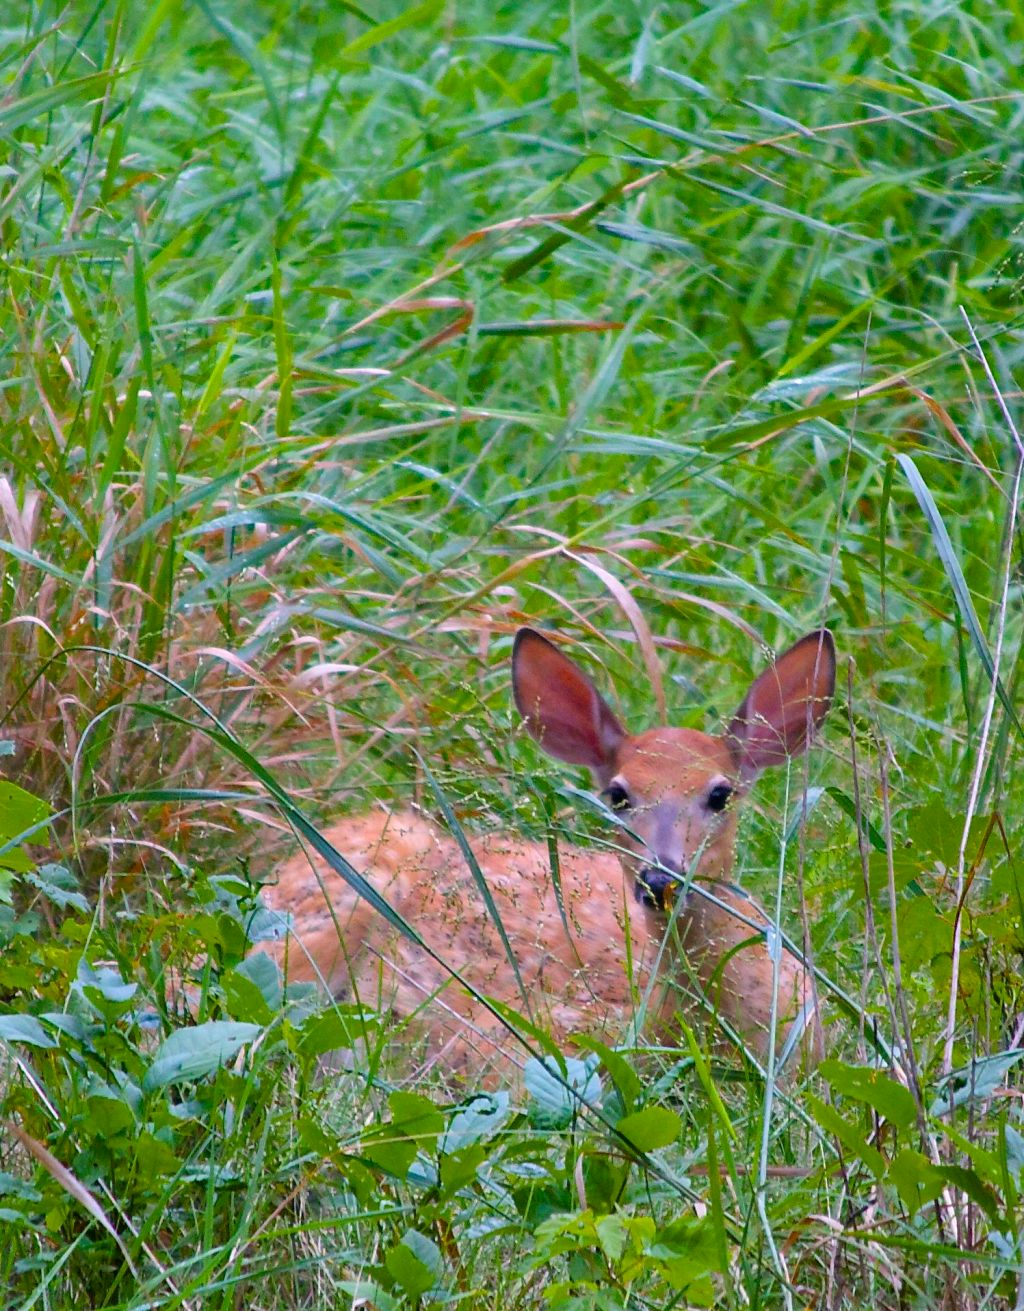 SCENIC-FAWN IN GRASS